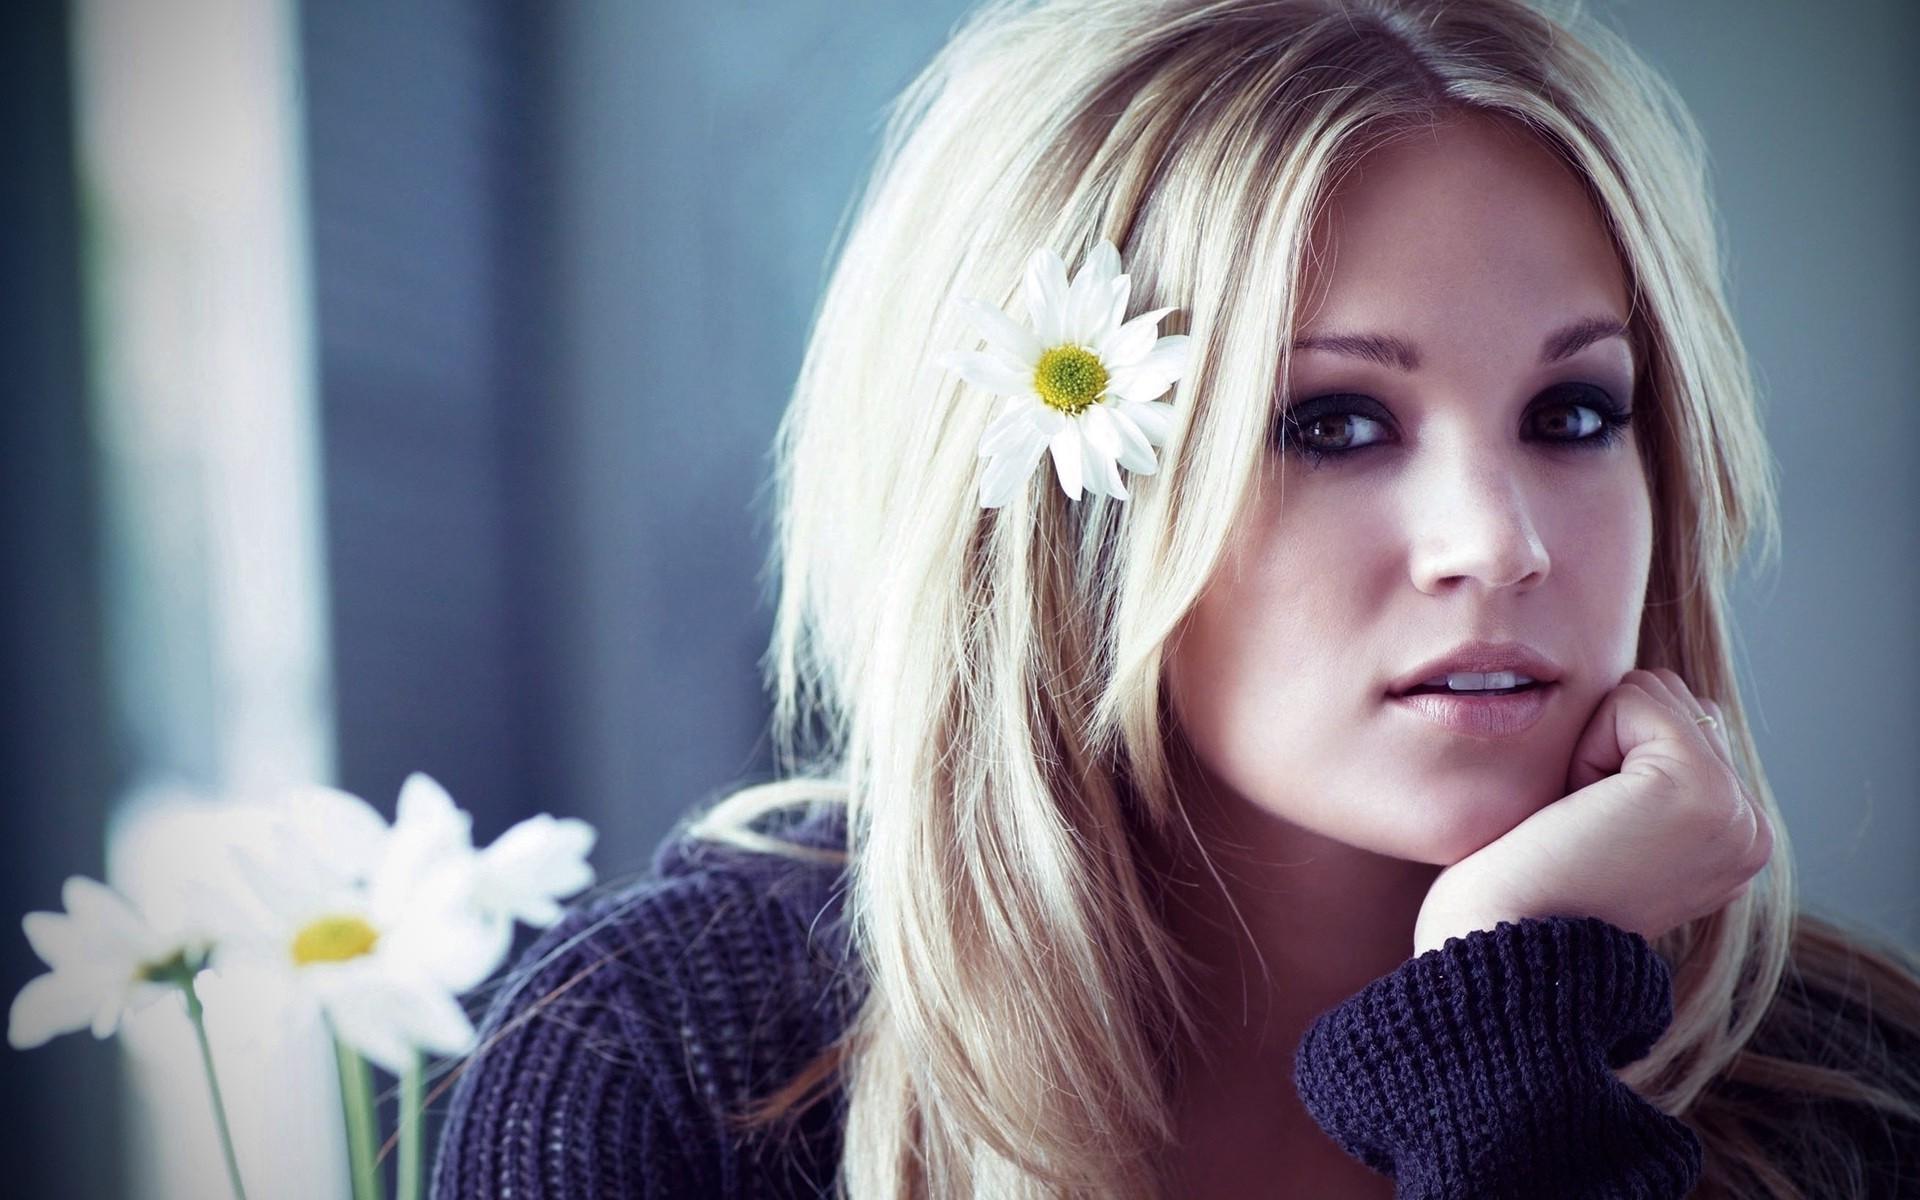 Картинки красивой девушки блондинки на аву